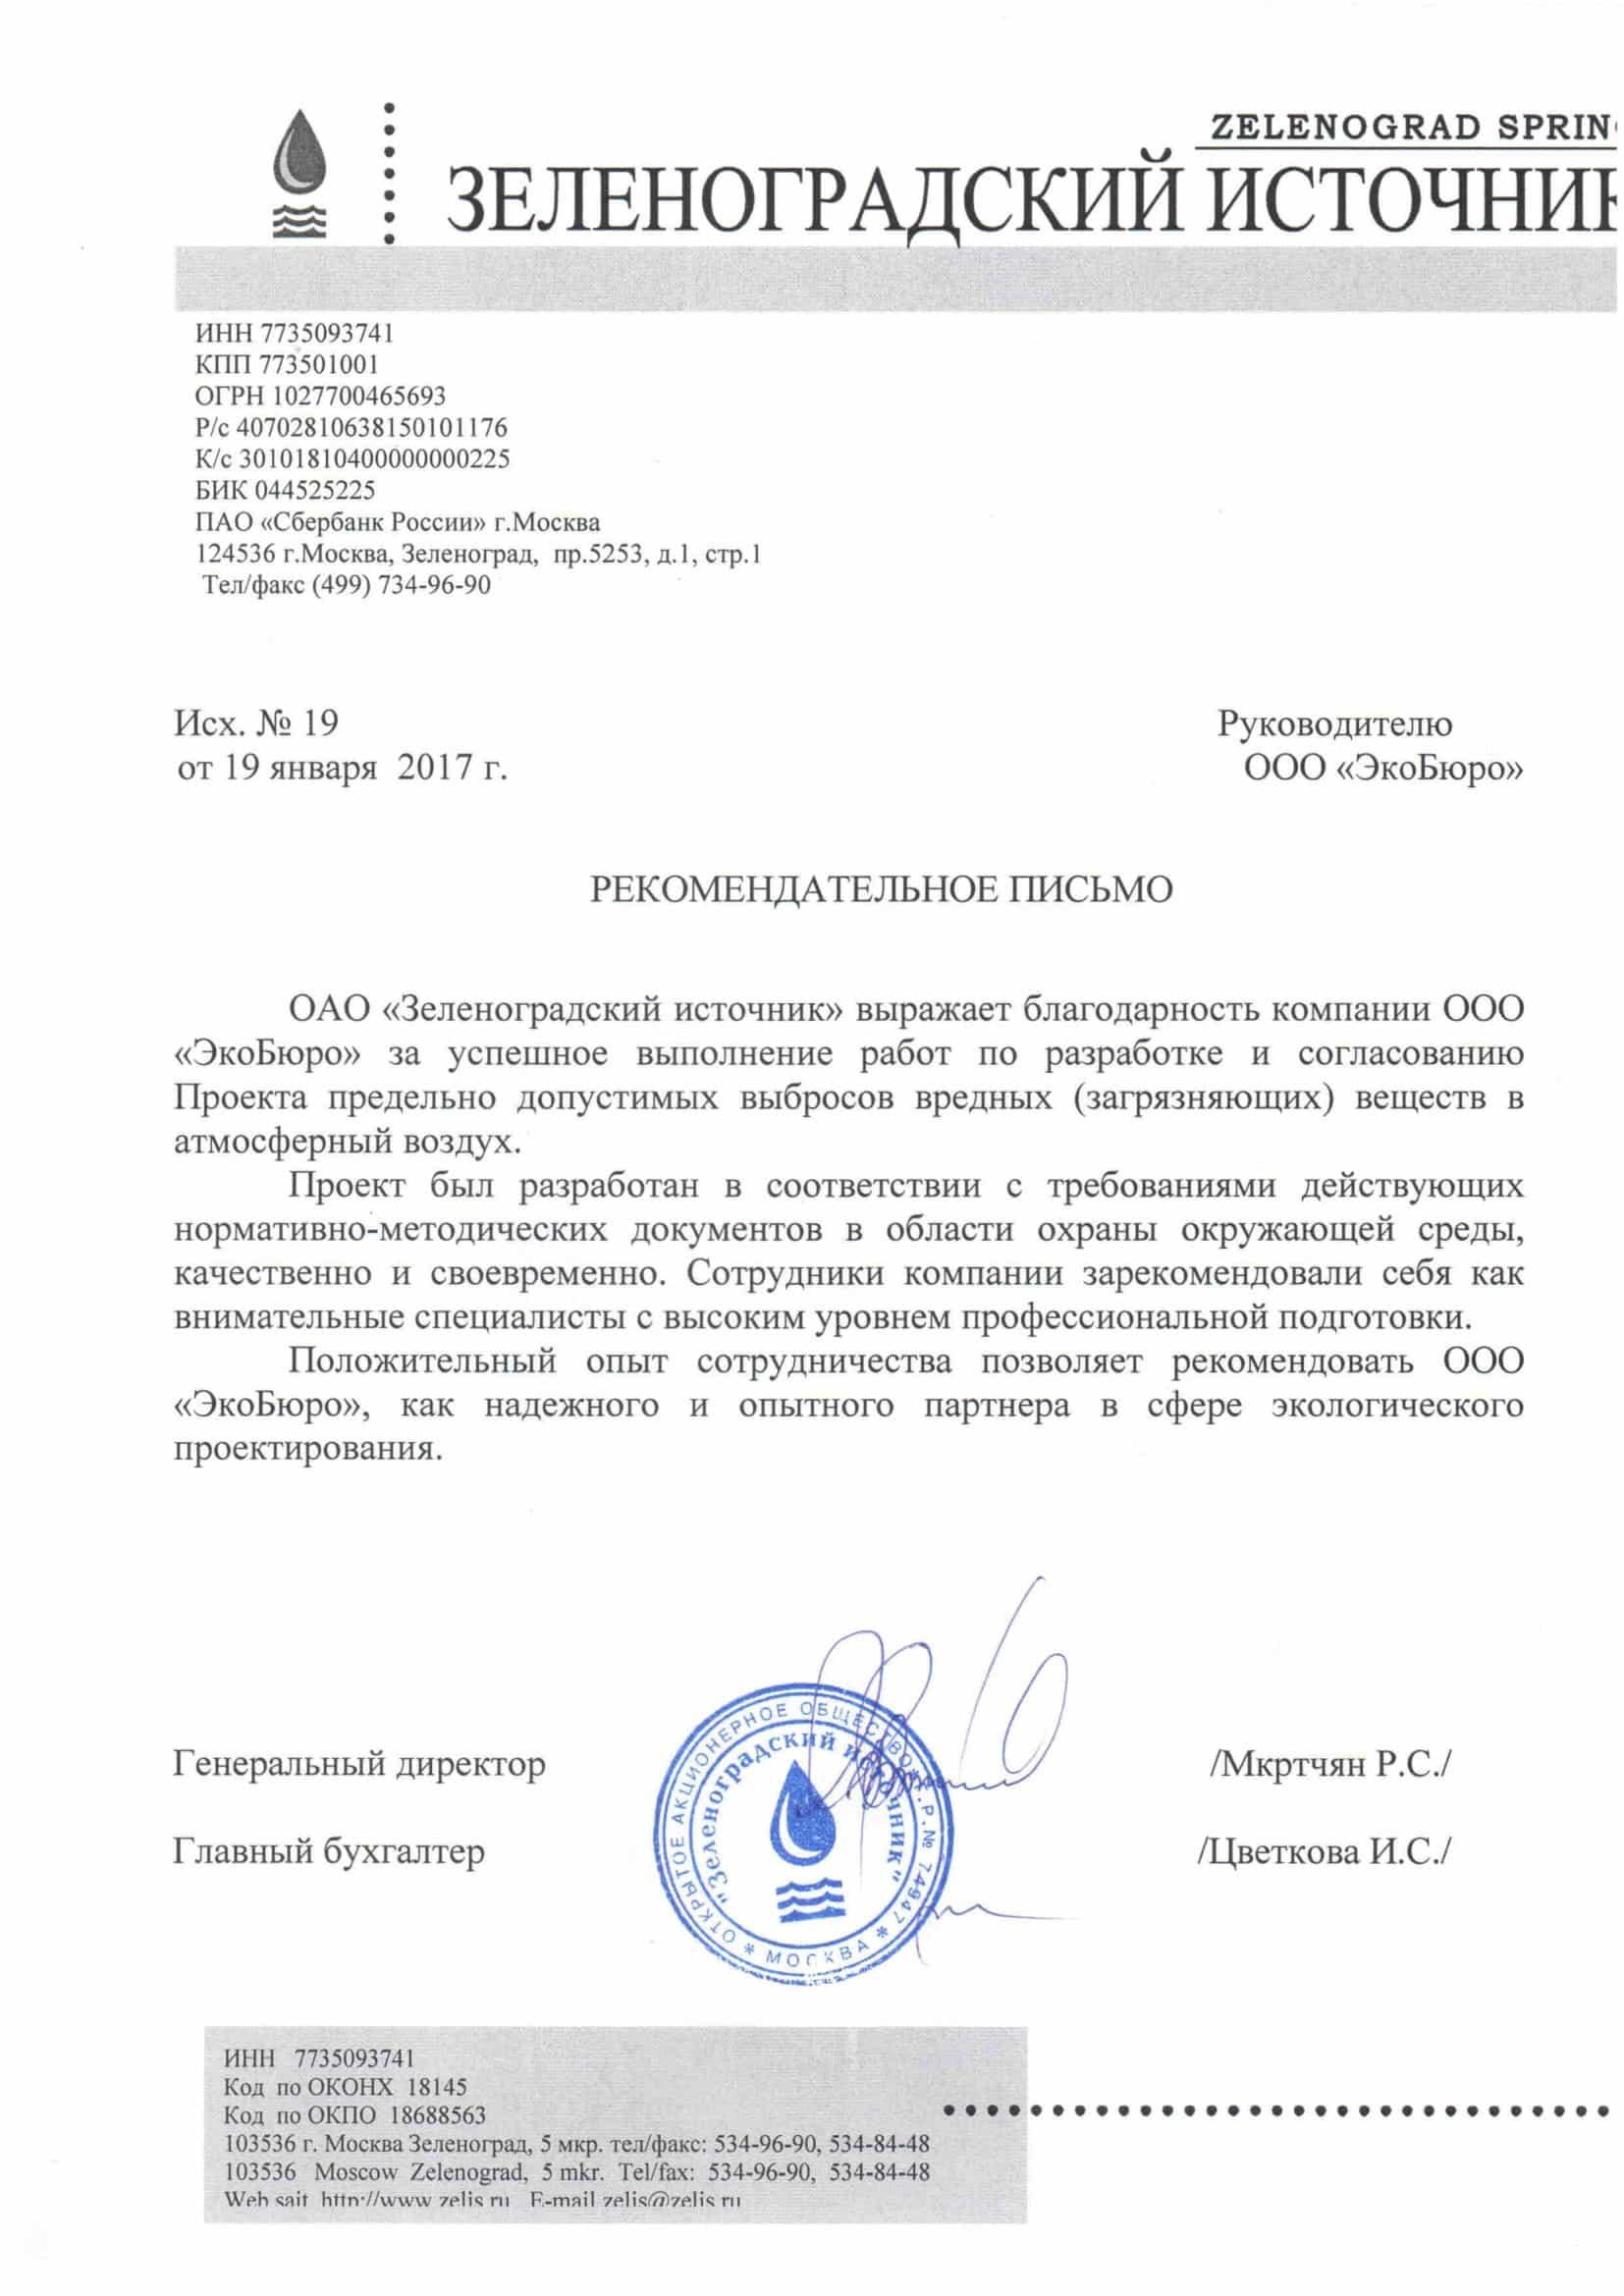 Зеленоградский источник ПДВ